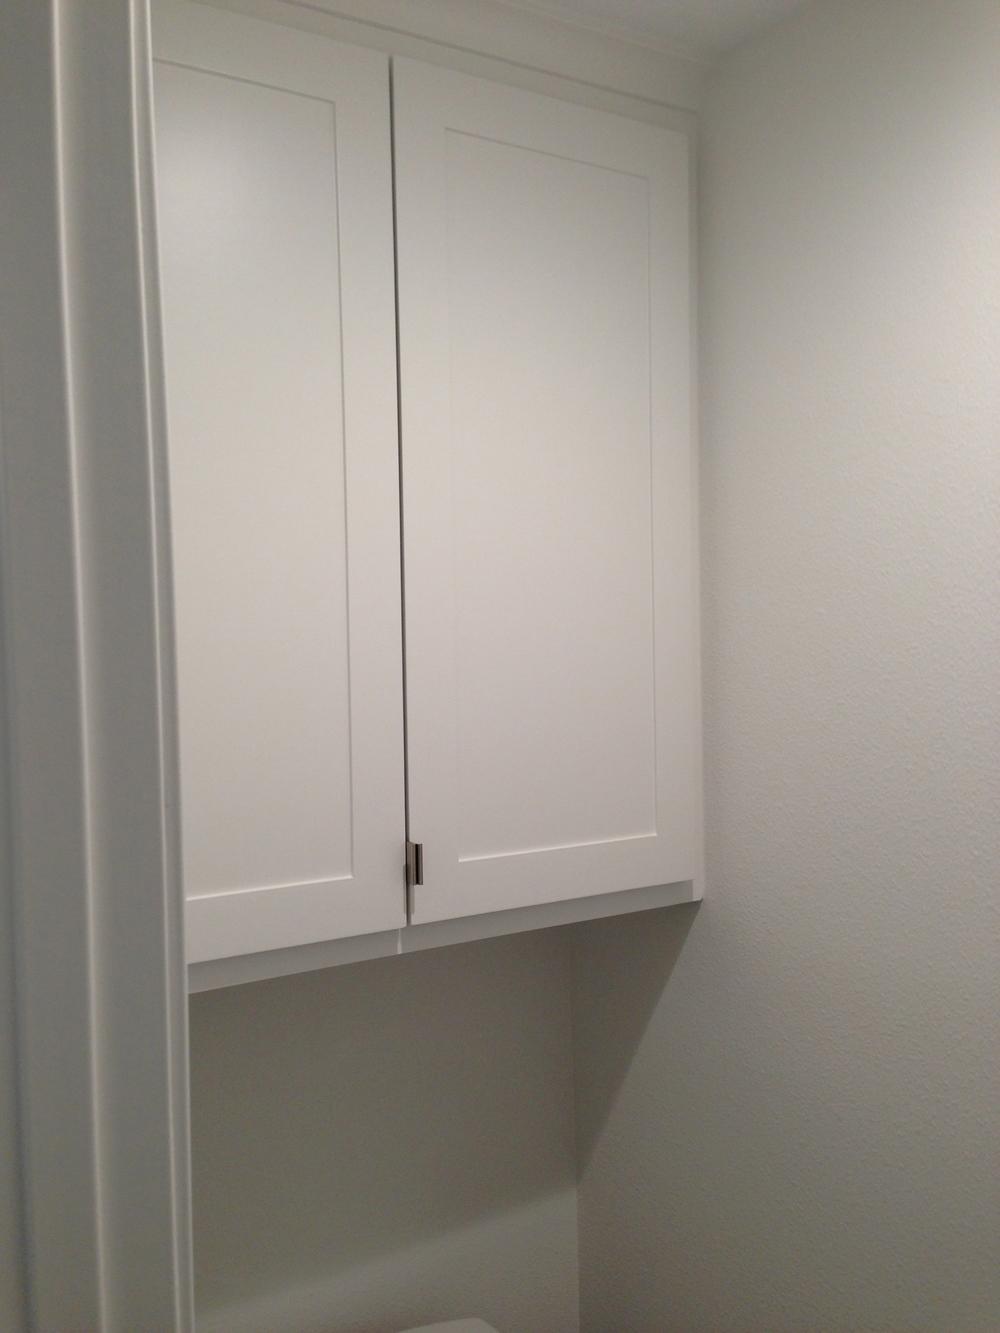 Private Water Closet